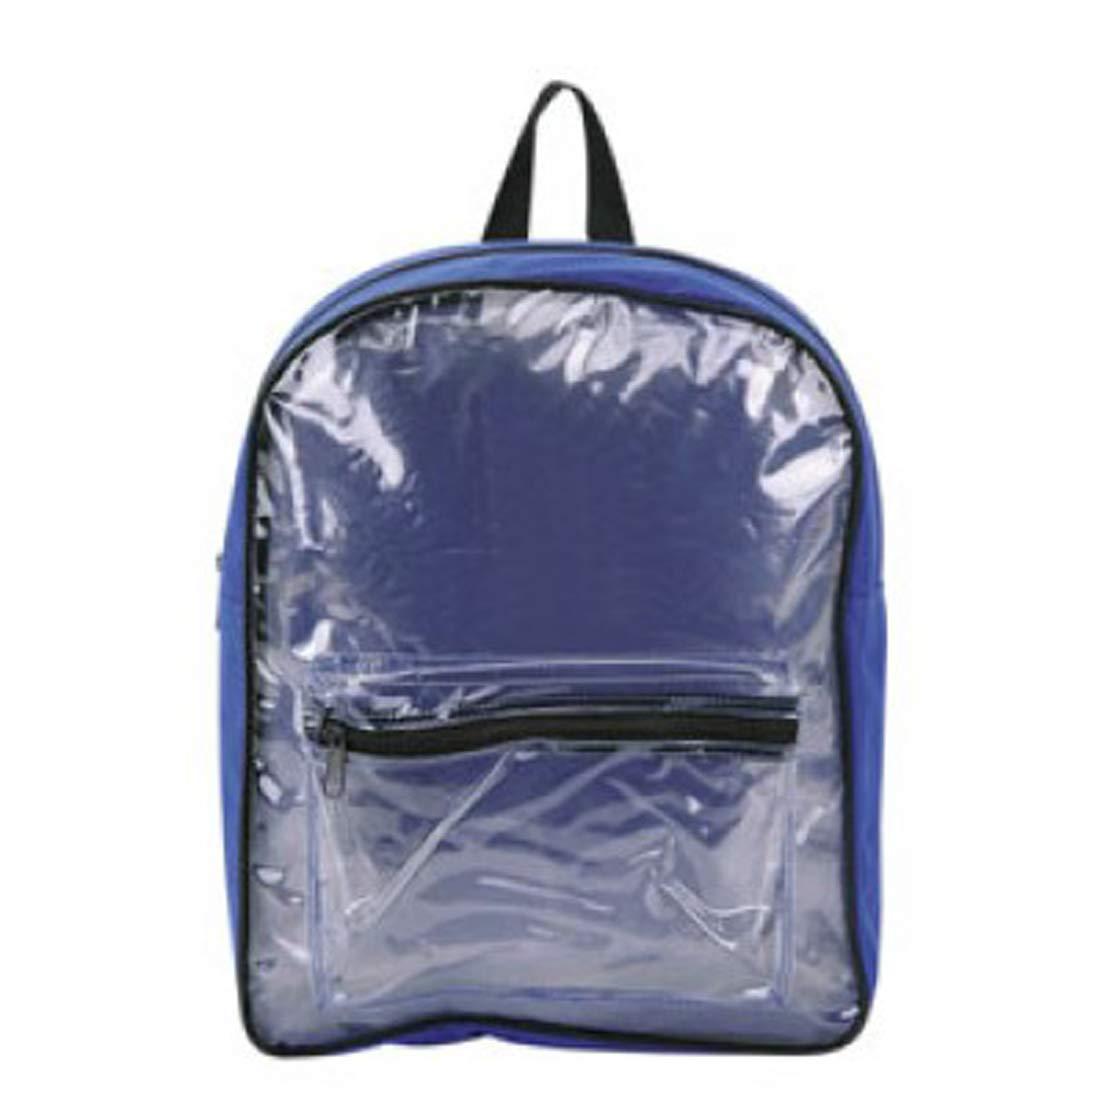 Multicolors Clear PVC Backpack  School Backpack  Gym Backpack (Royal bluee)